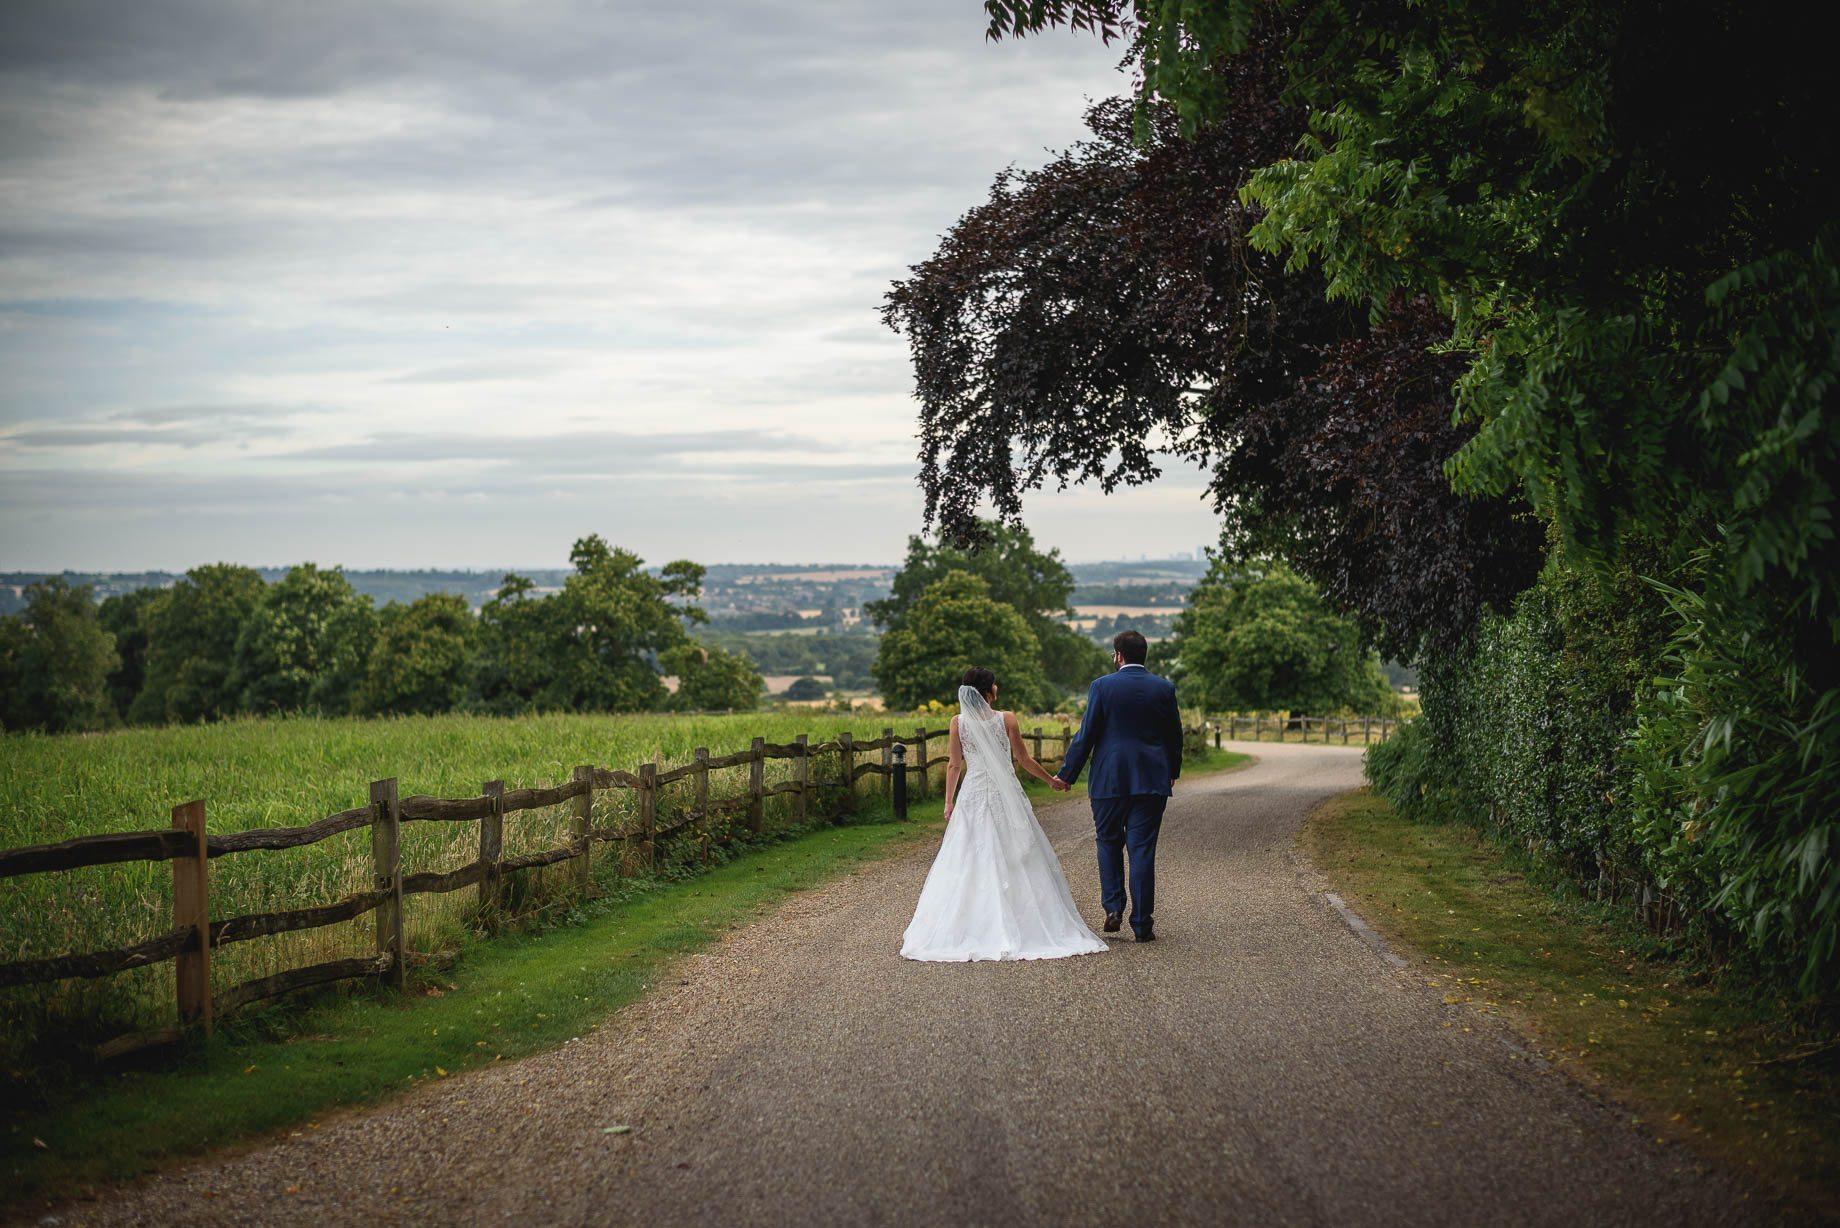 Gaynes Park wedding photography - Guy Collier Photography - Rachel and Jon (149 of 169)